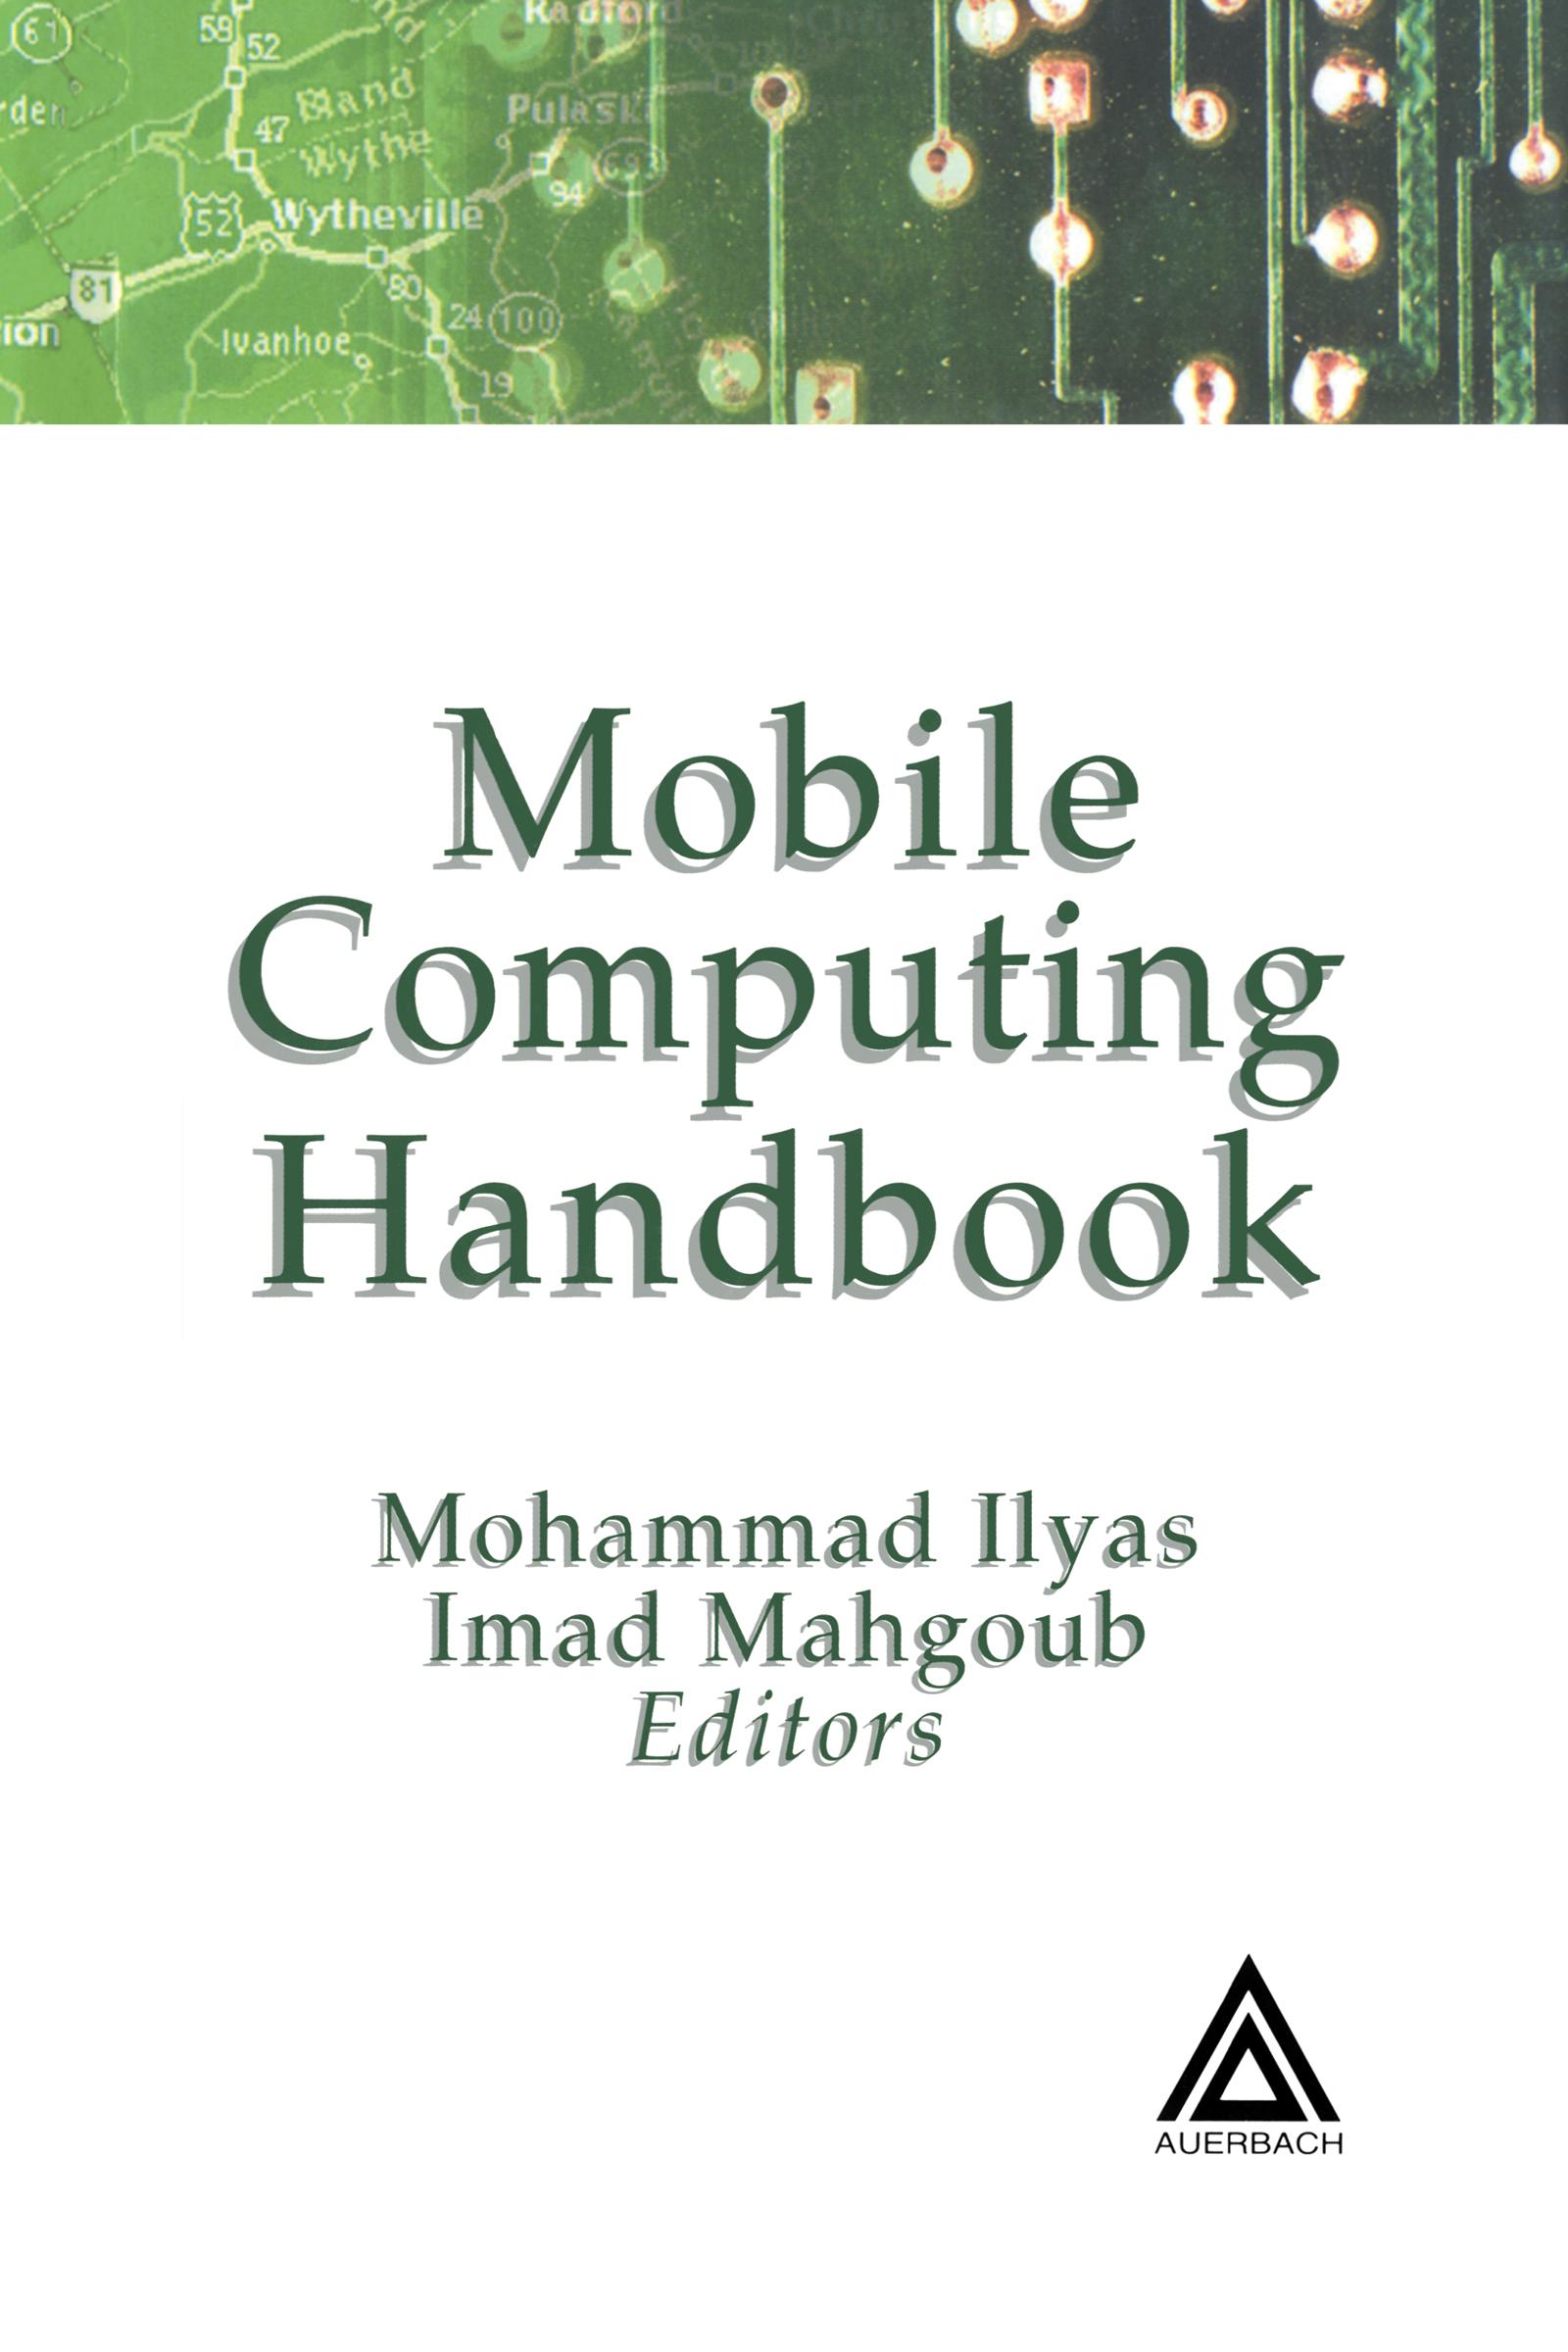 Mobile Computing Handbook: 1st Edition (Hardback) book cover